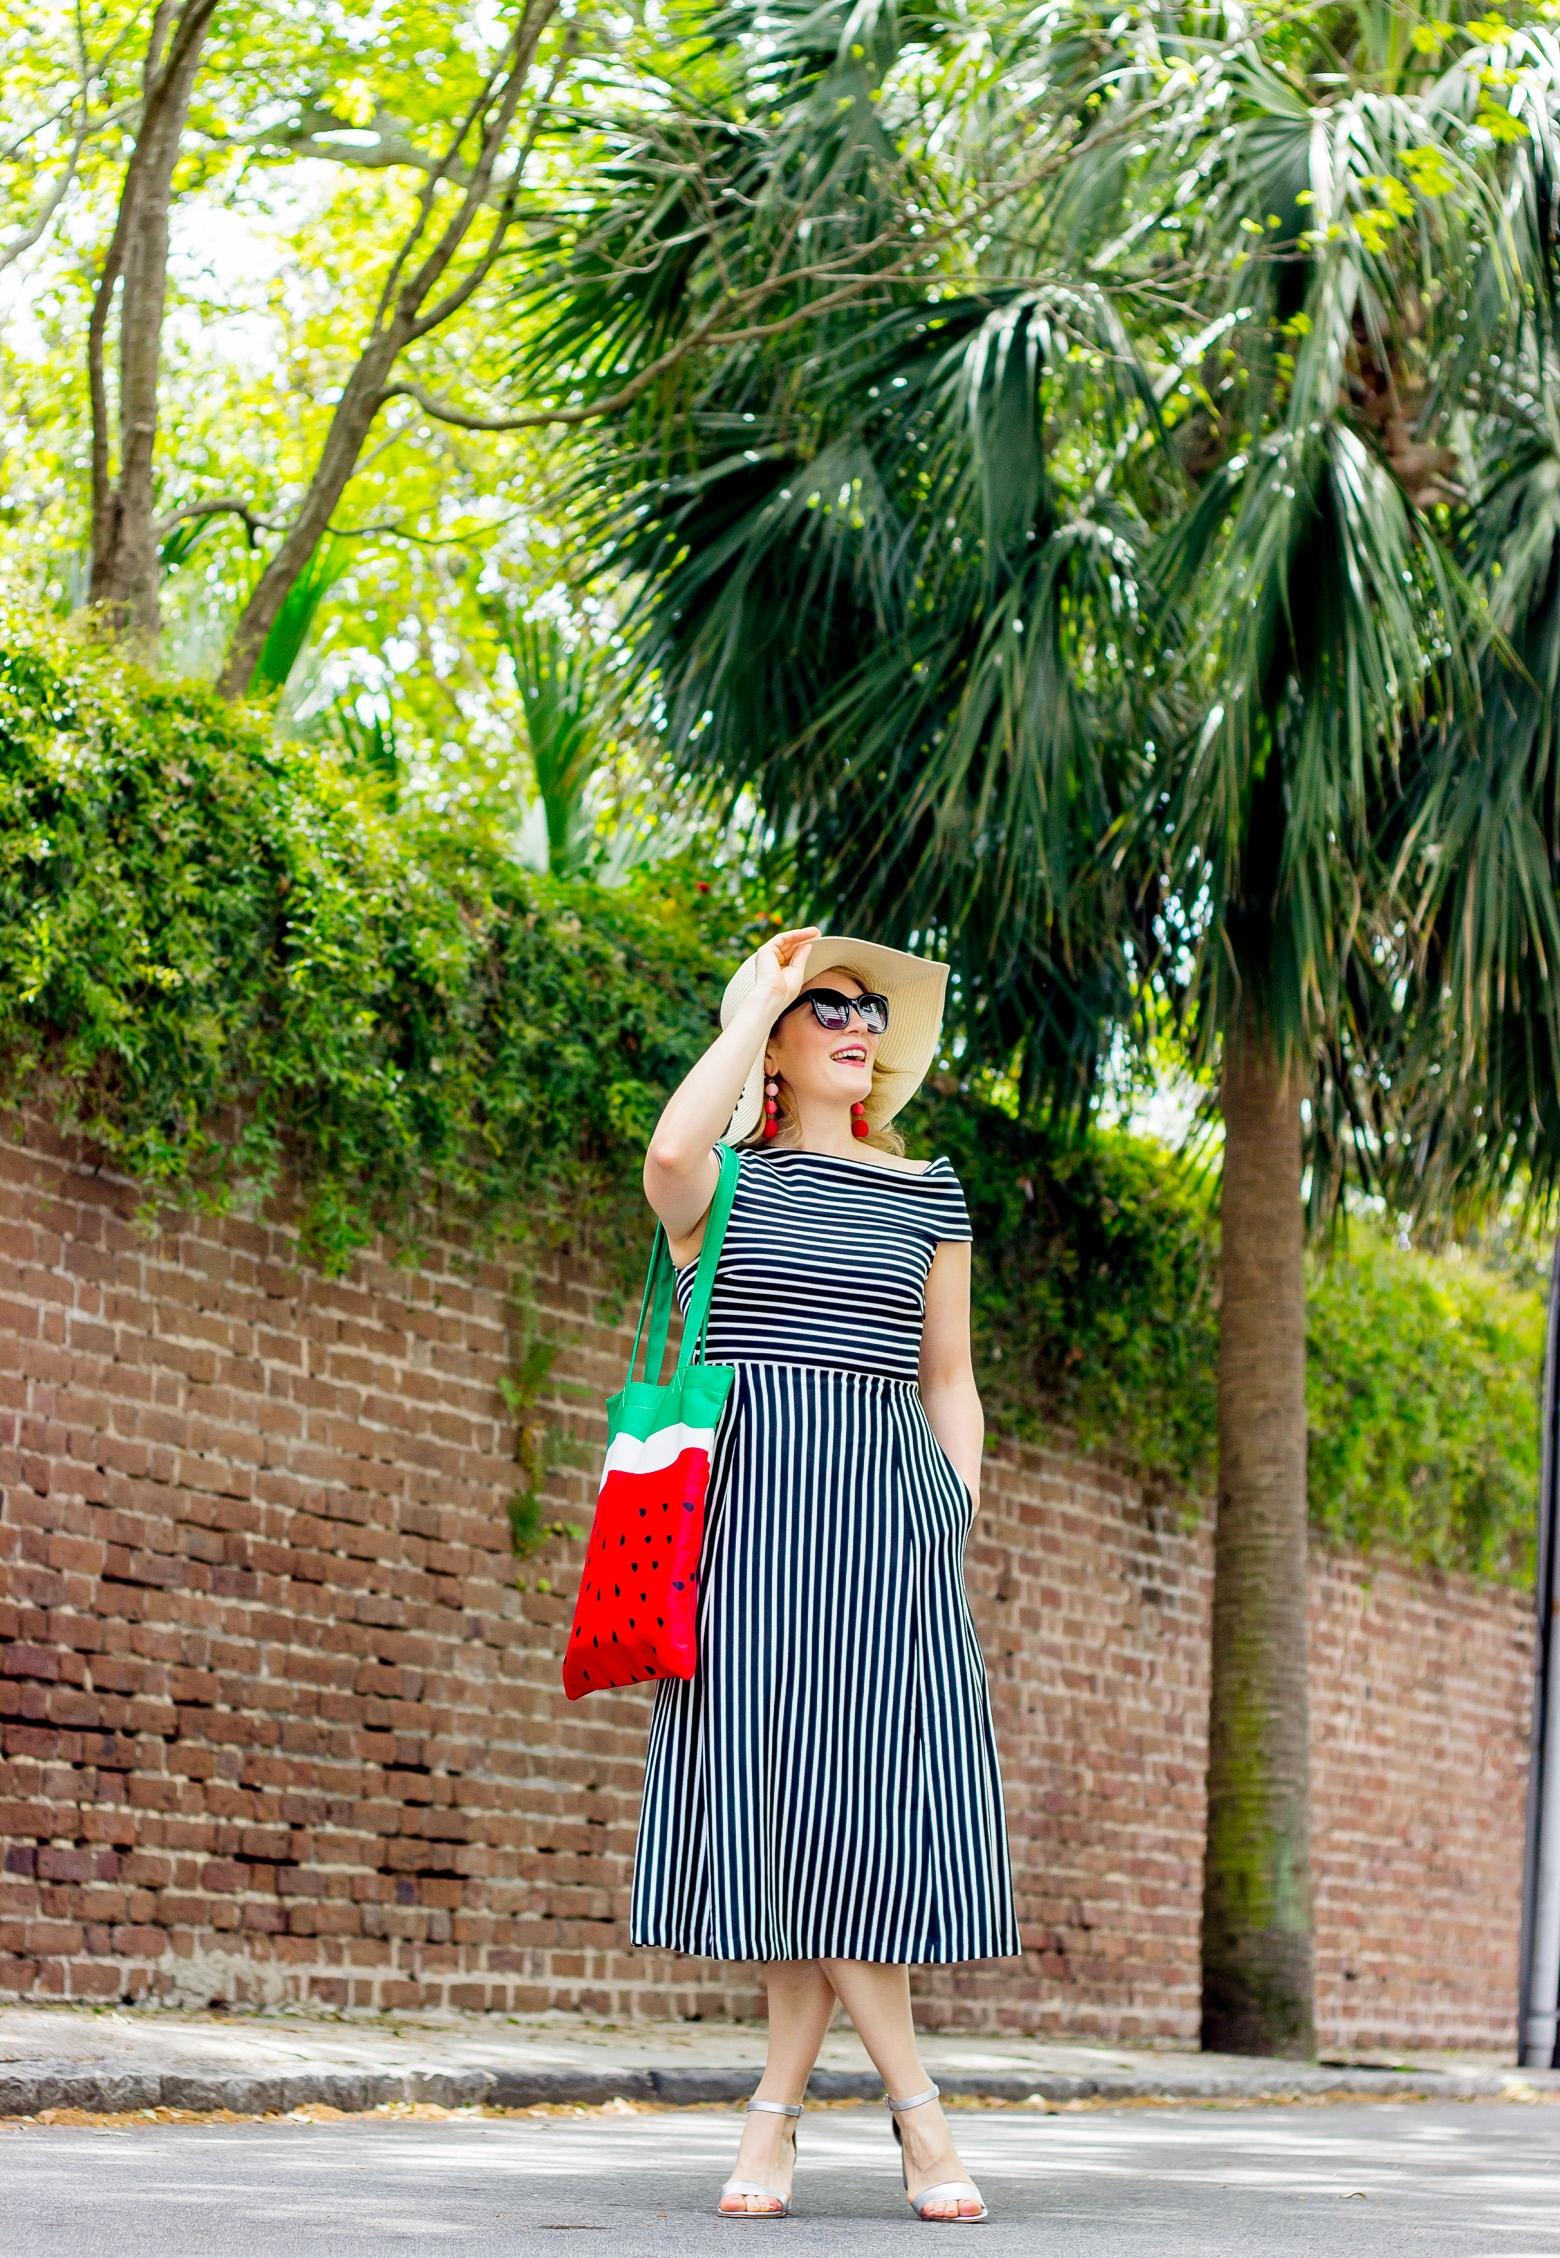 Midi dress and watermelon accessories